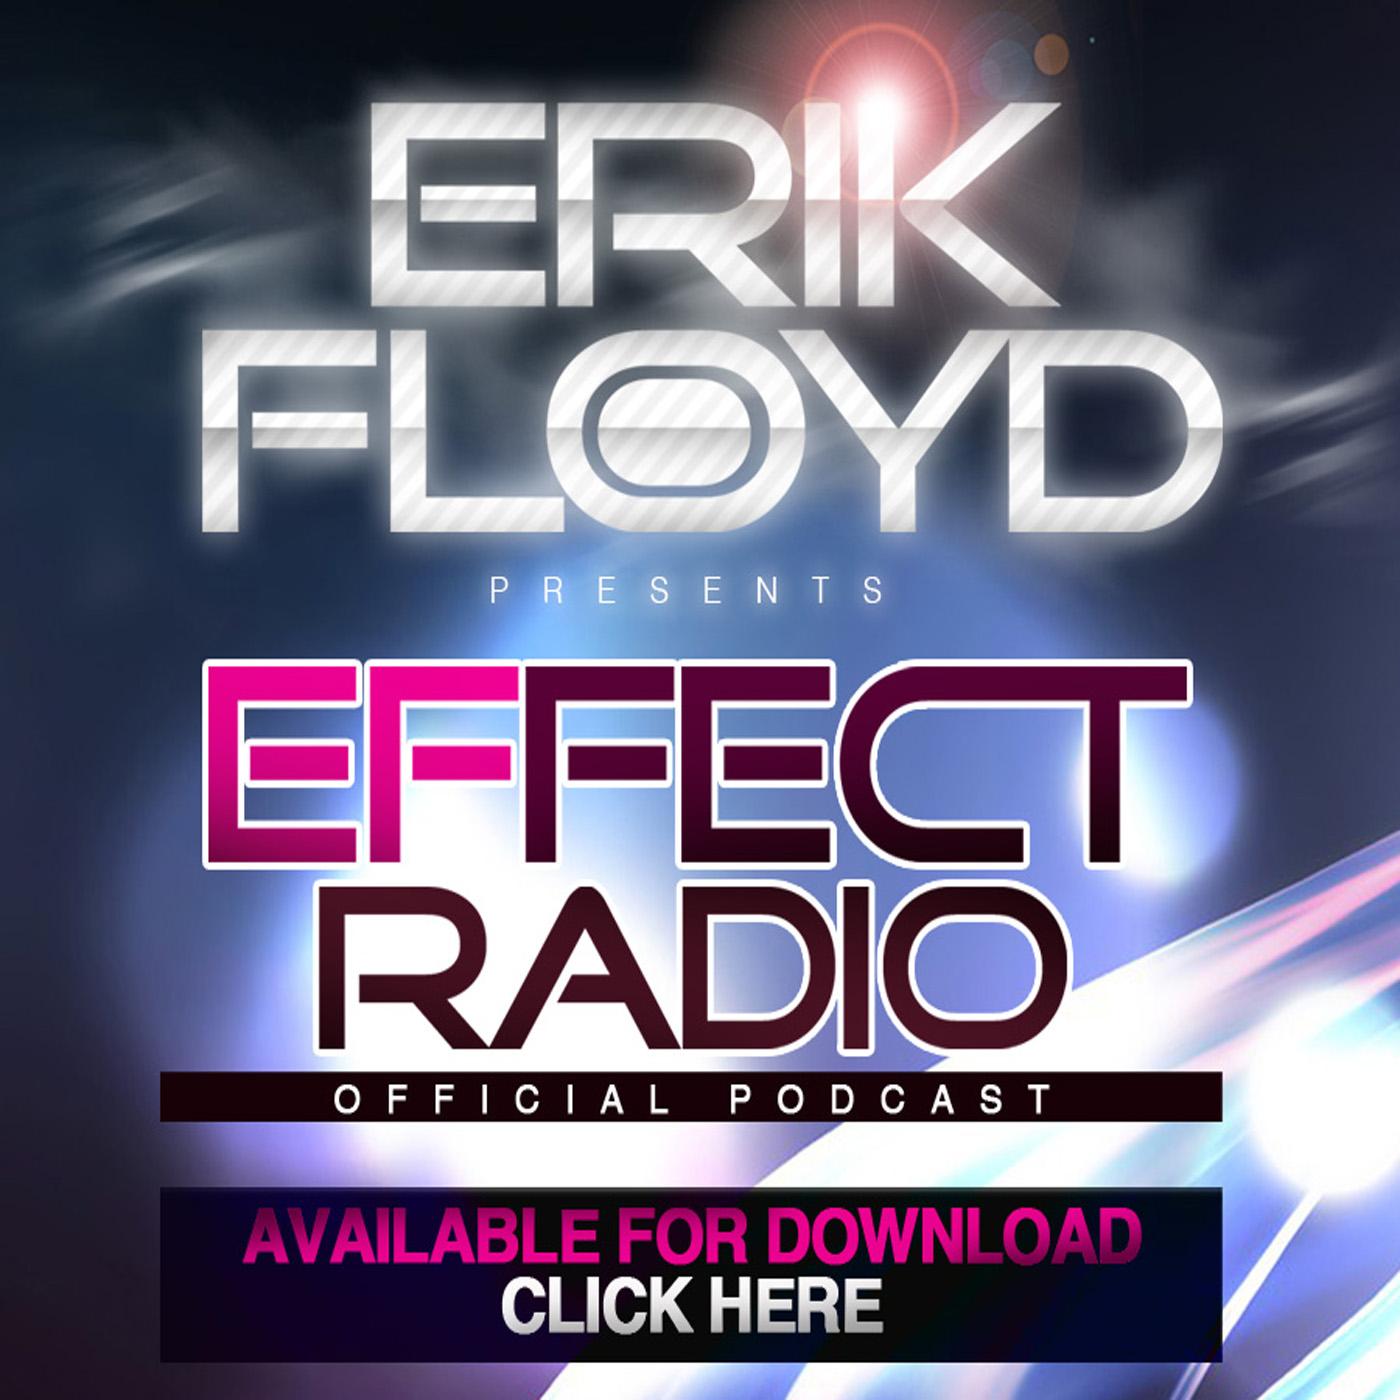 Erik Floyd | Effect Radio